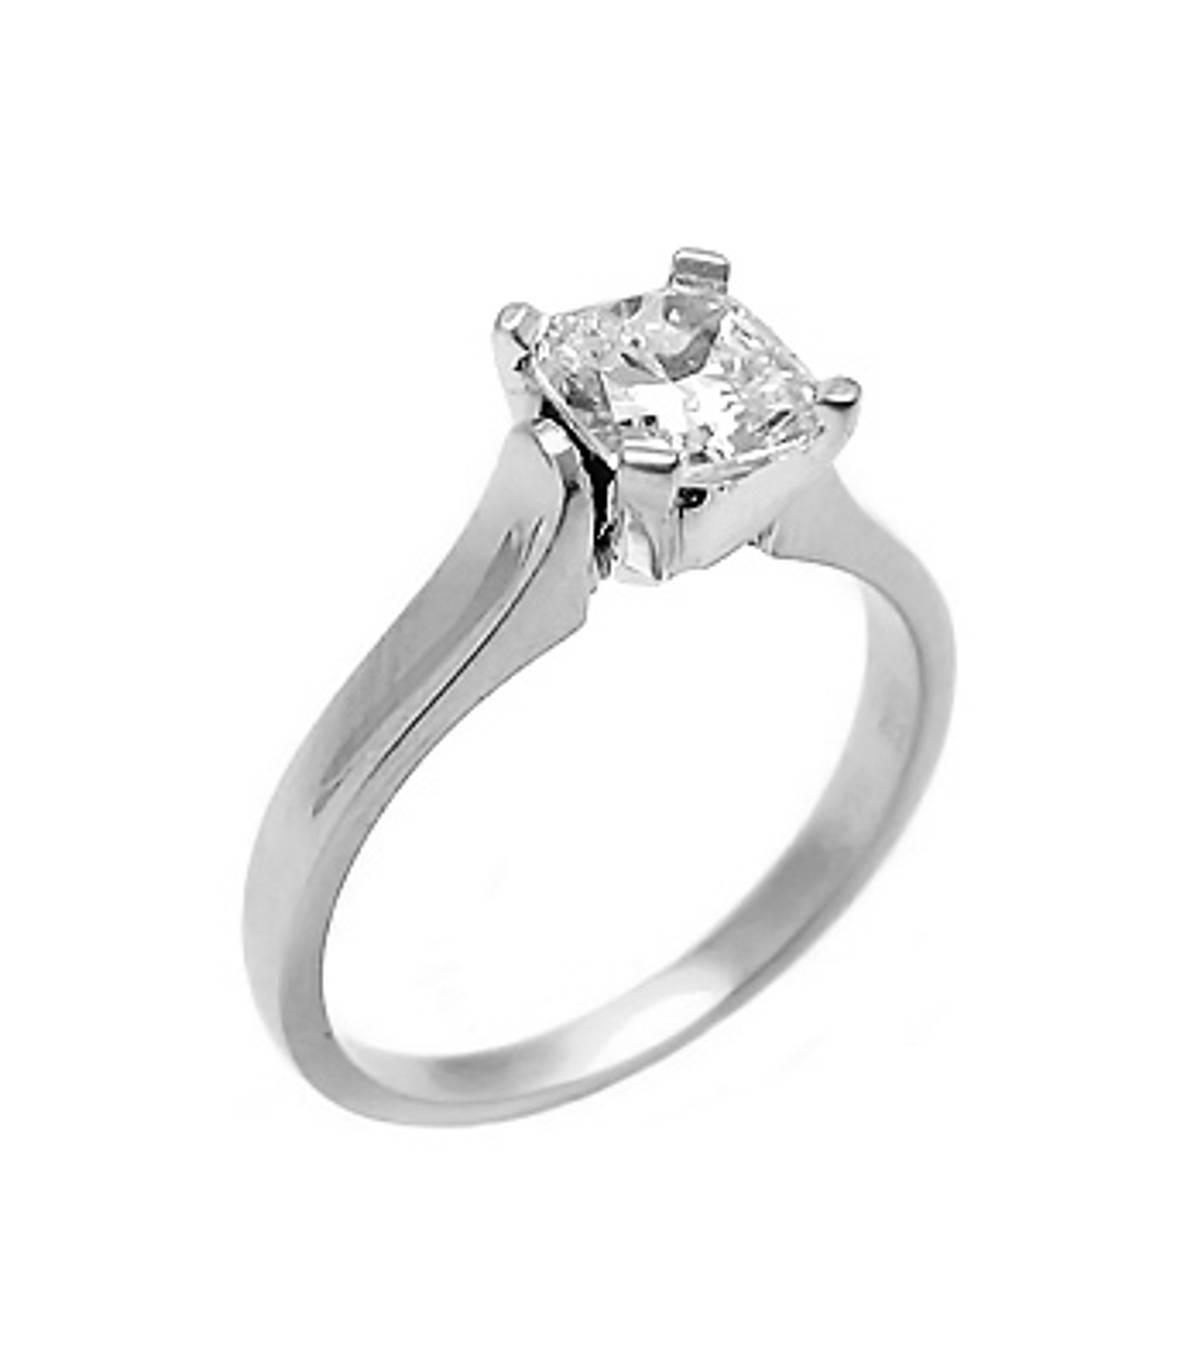 Irish made1.04carat cushion shape diamond ring set in 18ct white gold